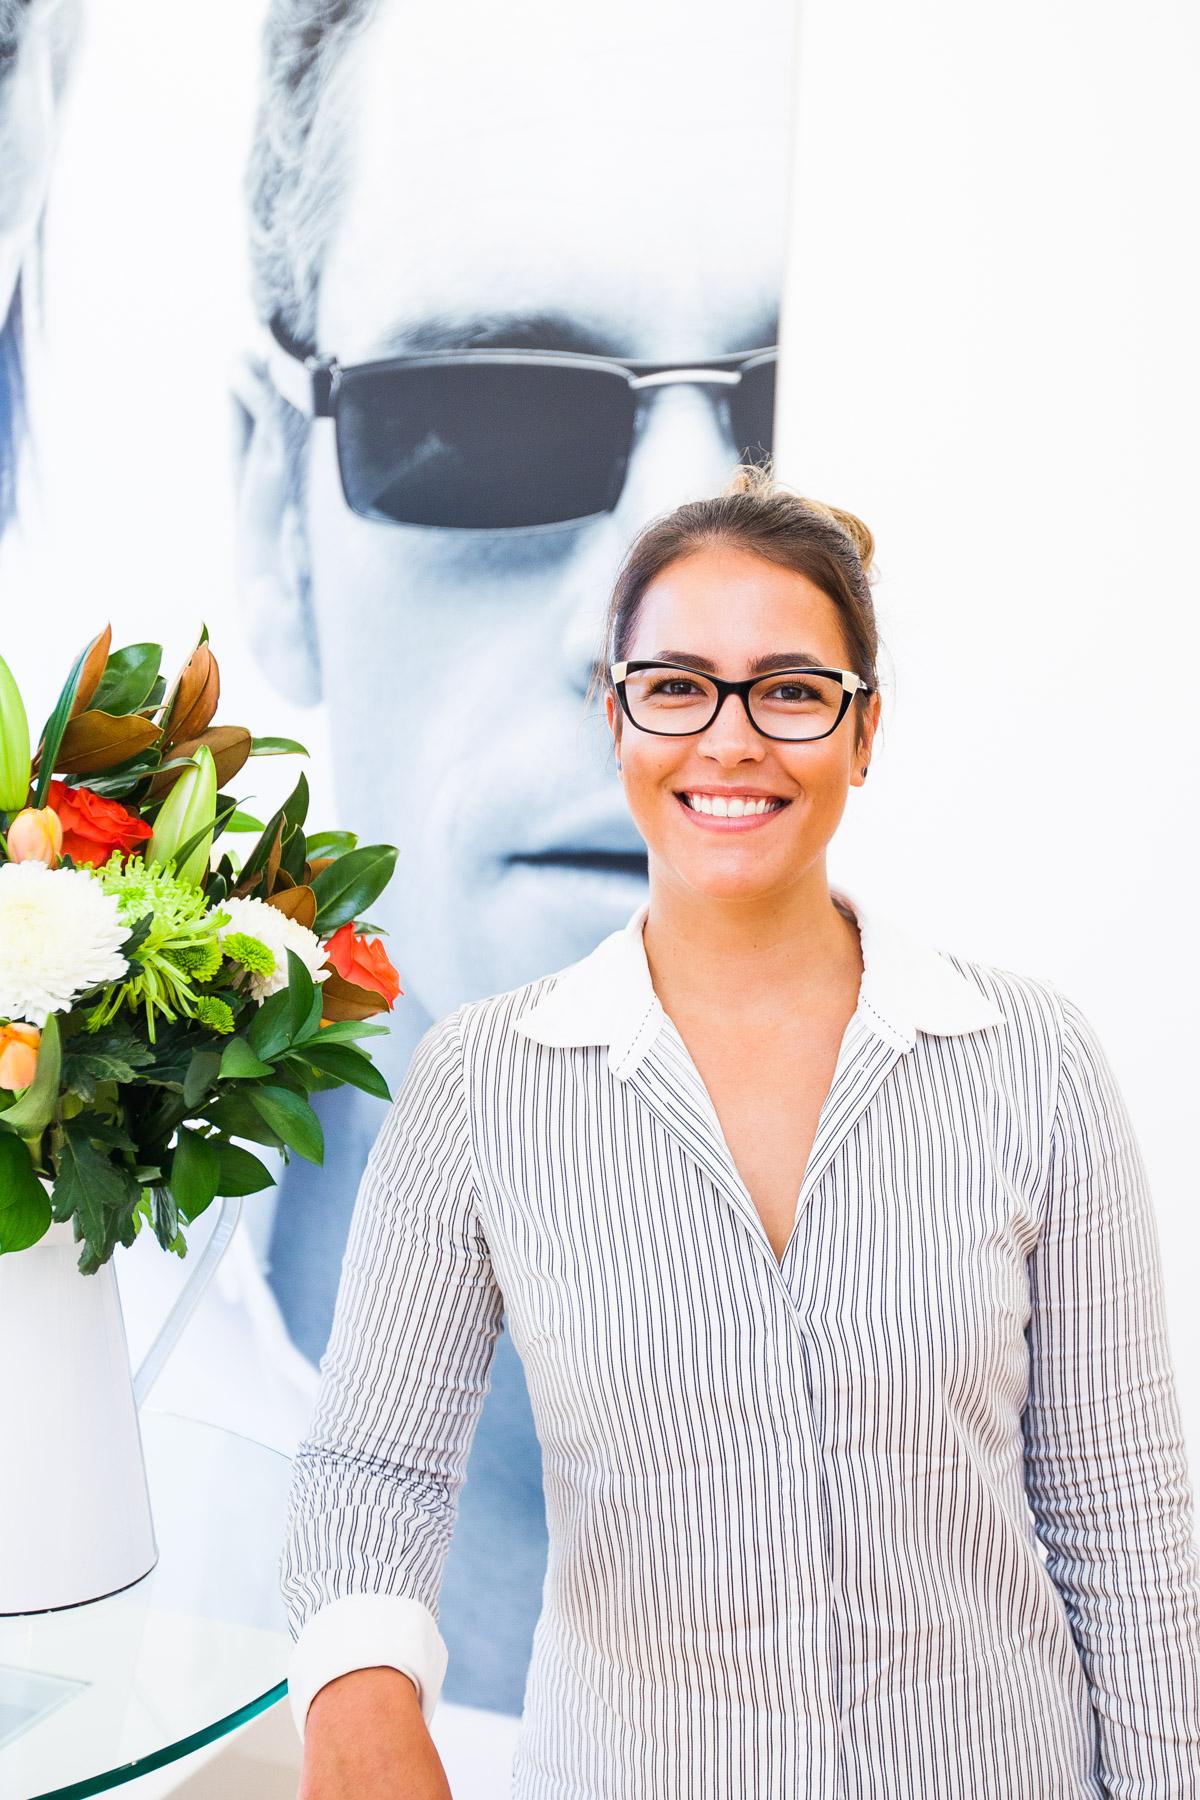 Tamara Karolewicz - Optometrist at Eyre Eye Centre, Port Lincoln